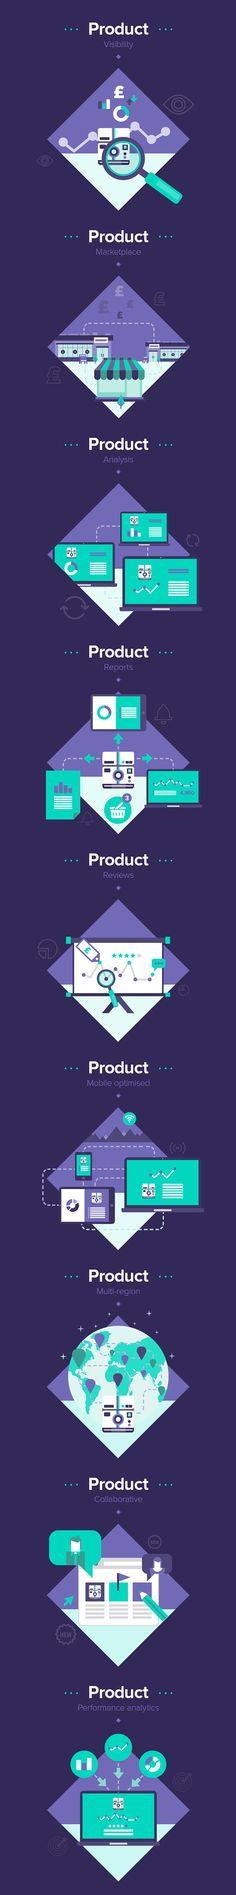 RetailVision // App & Illustration on App Design Served